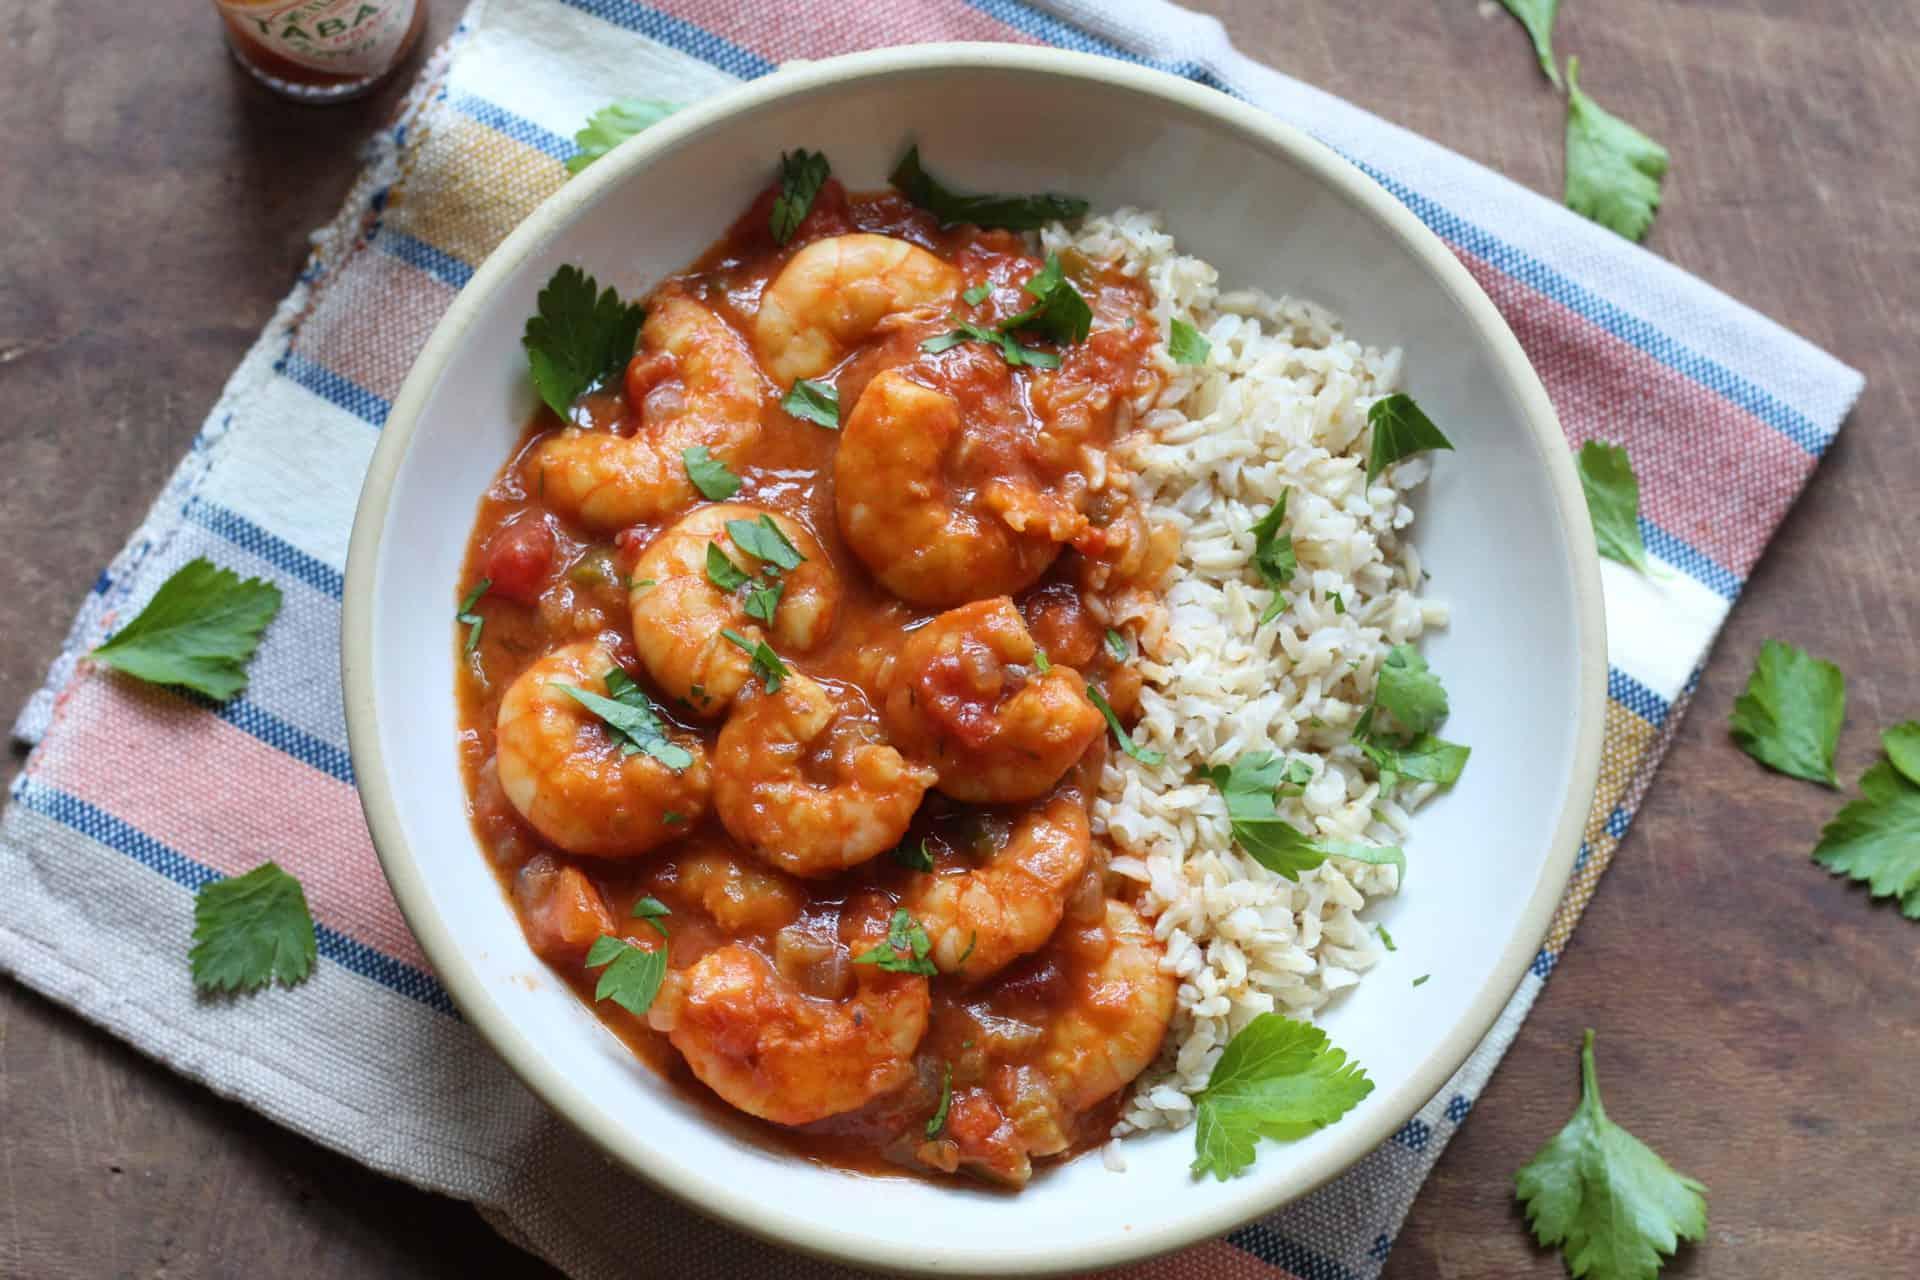 Shrimp, Seafood, Dinner, Summer, Spring, Quick & Easy, One Pot, Bowls